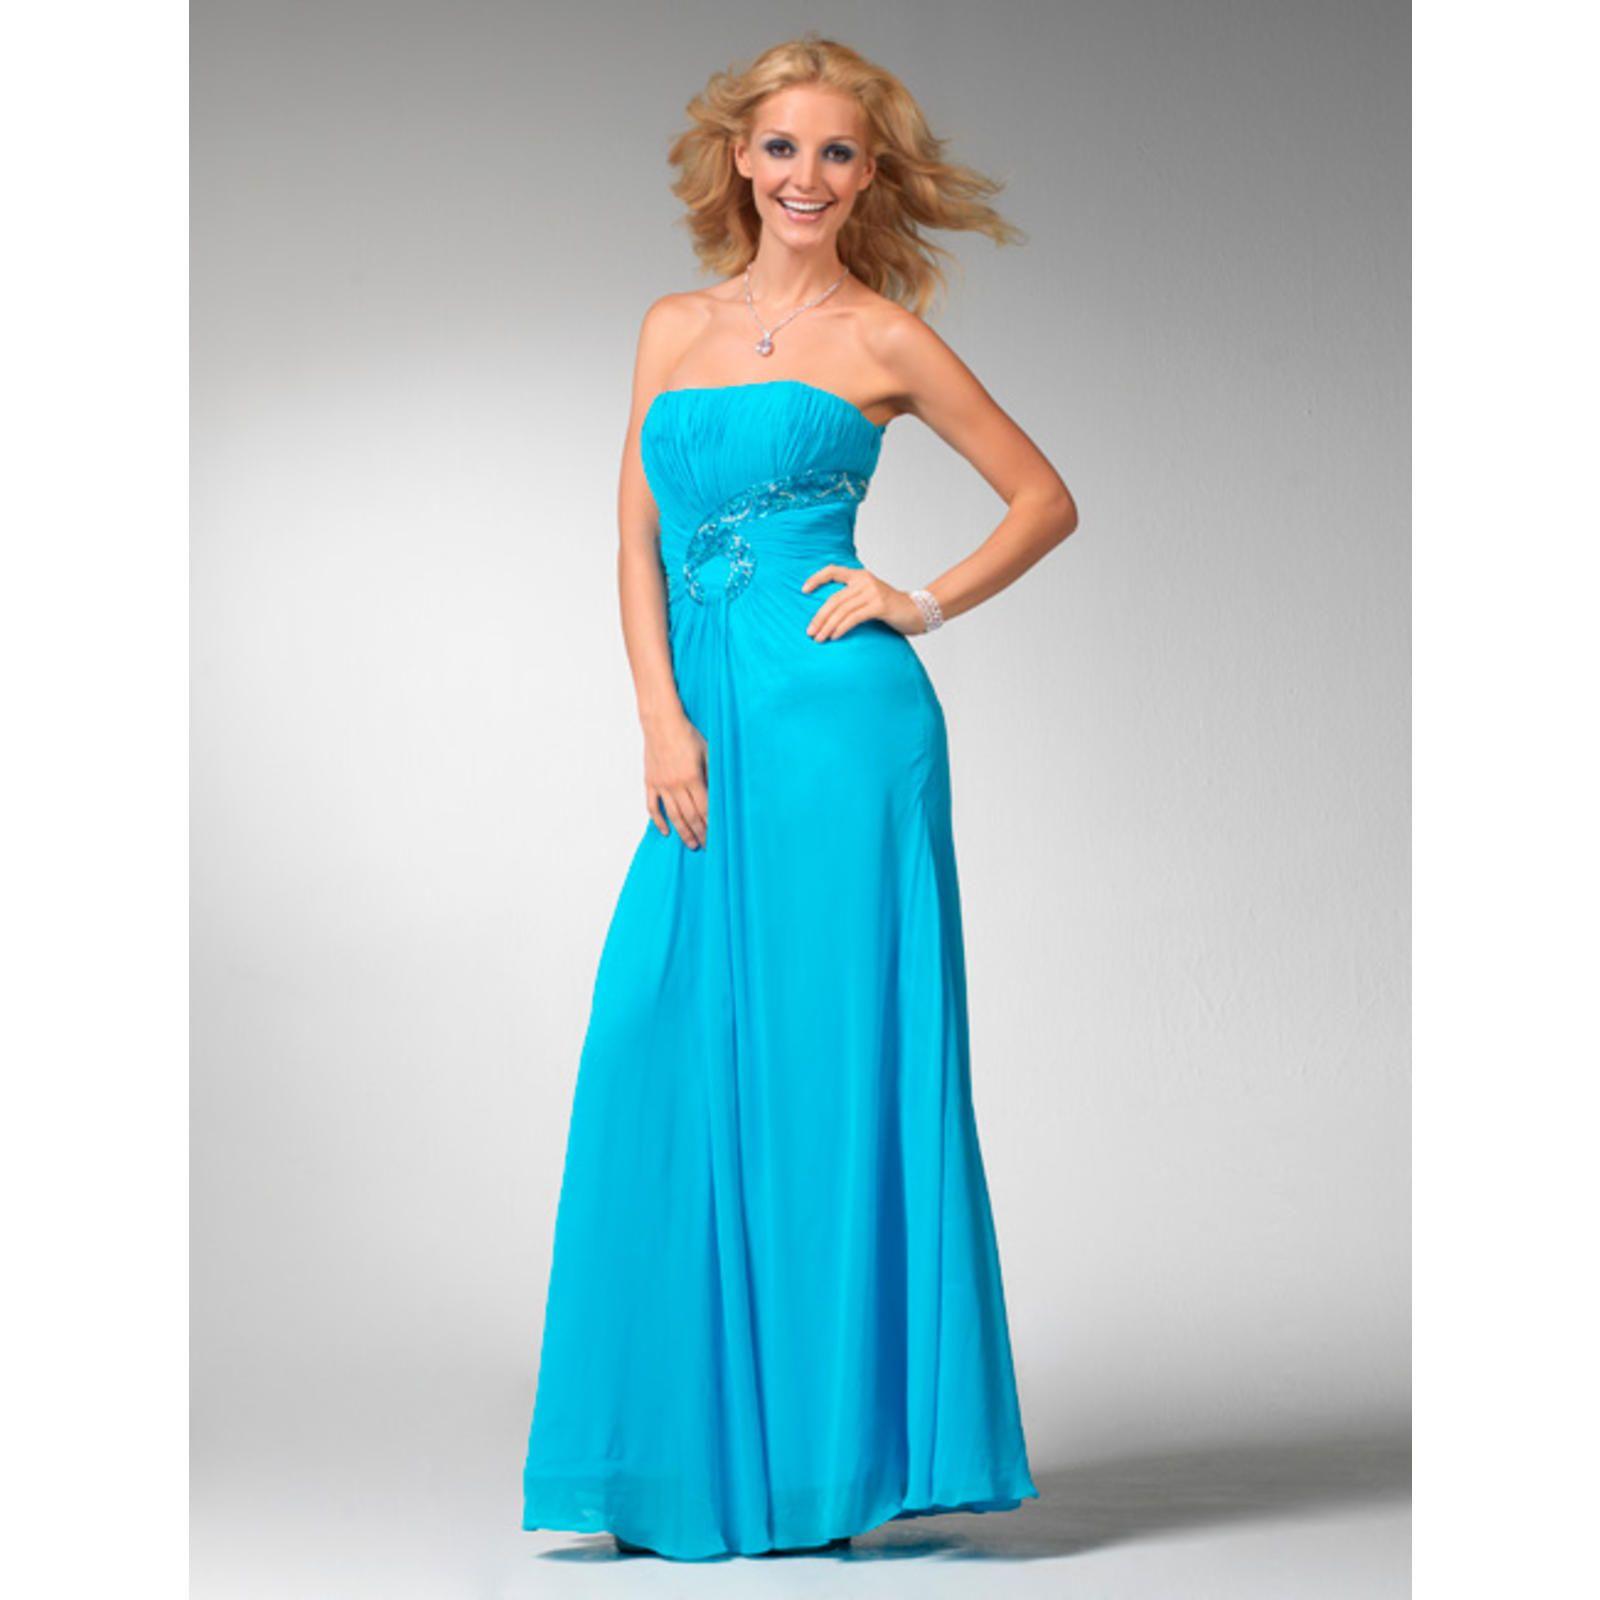 Clarisse Clarisse Strapless Chiffon Prom Dress 1533 - Aqua blue ...